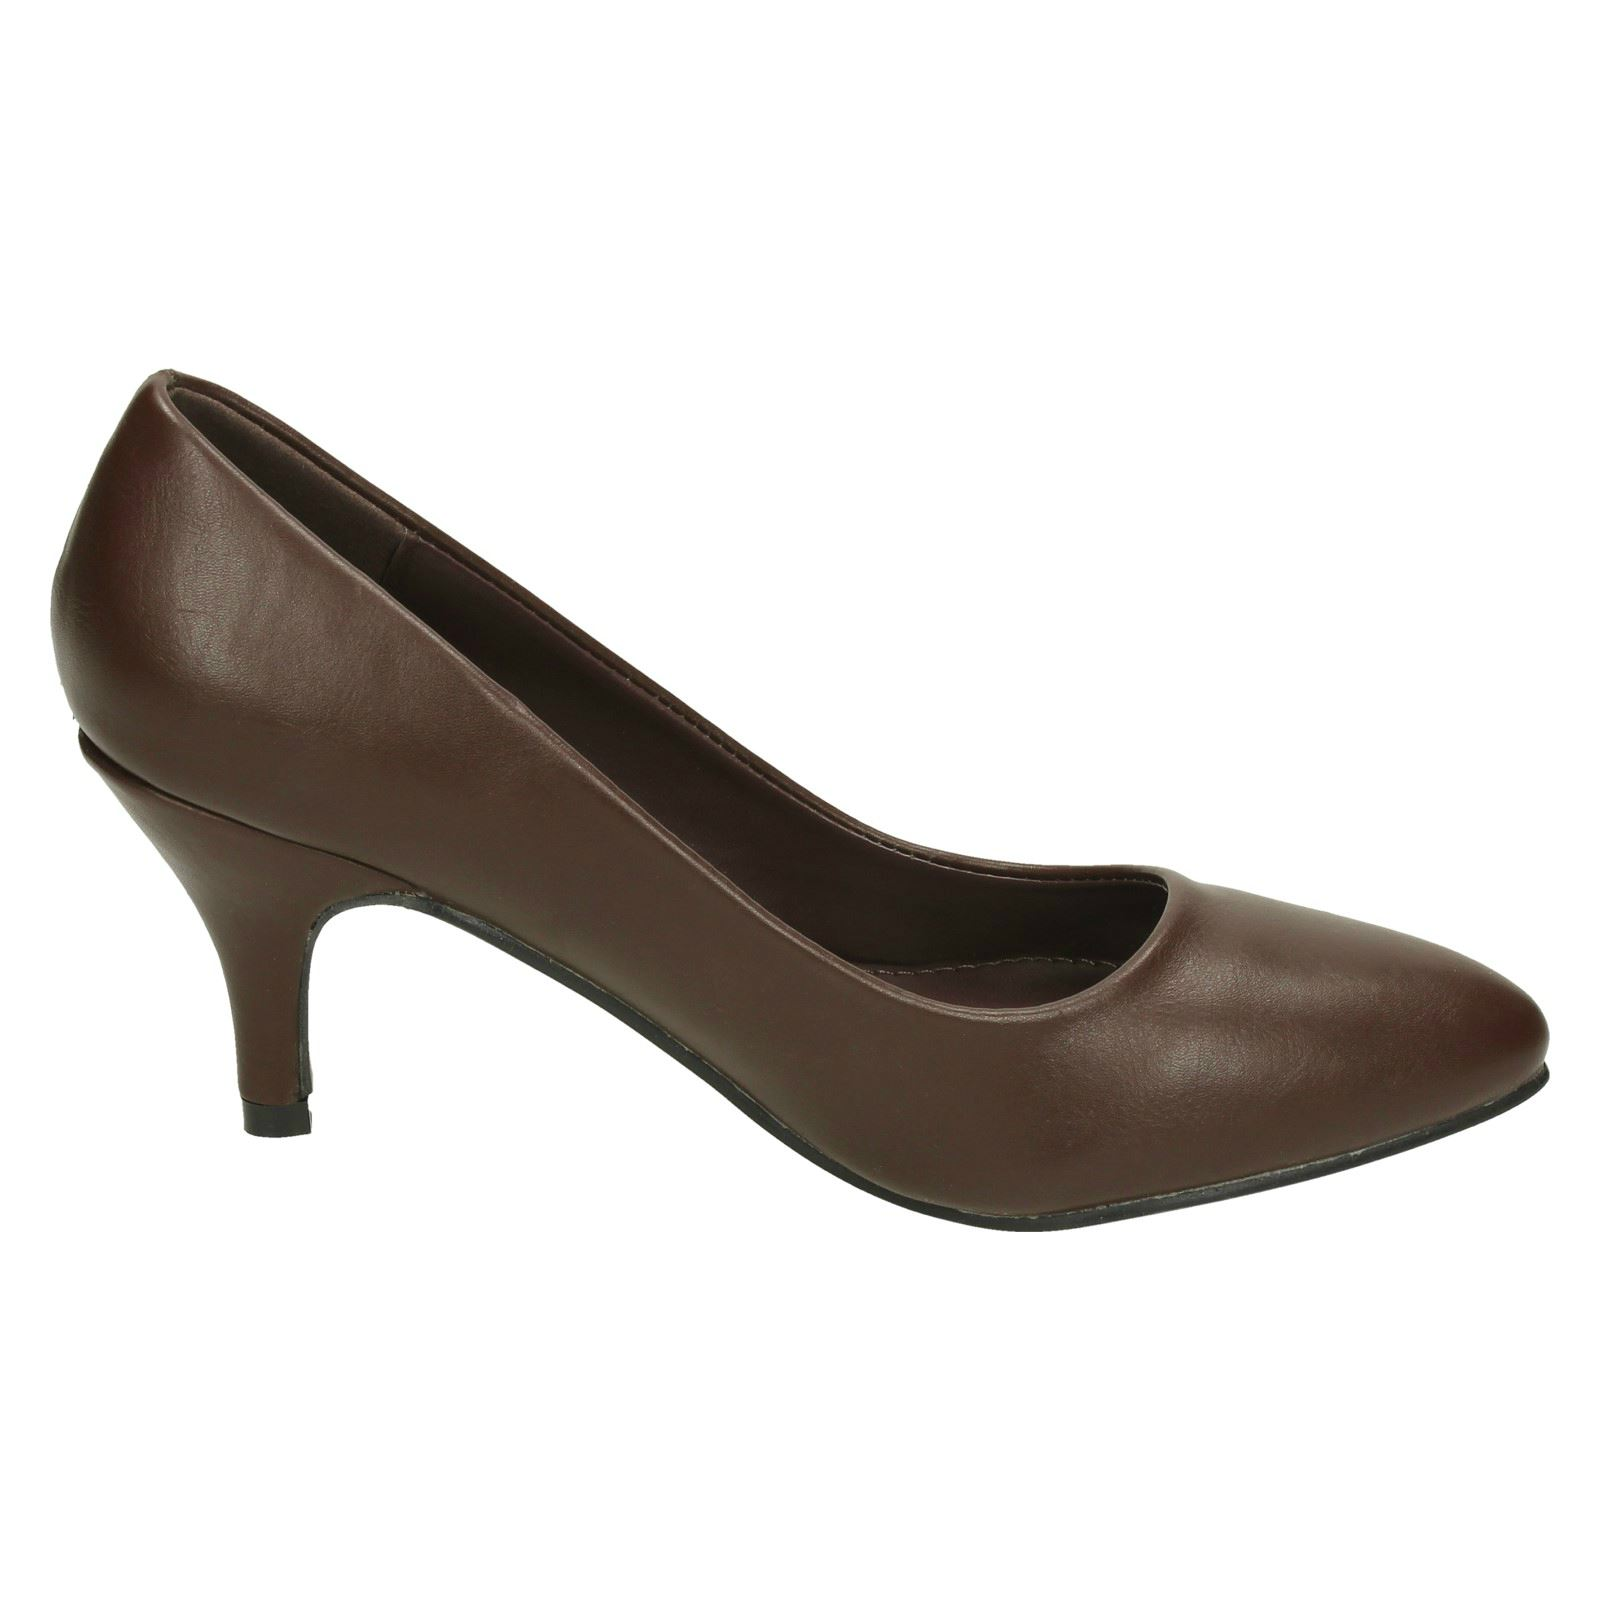 Donna-Spot-On-Tacco-Medio-a-Punta-Court-039-Scarpe-039